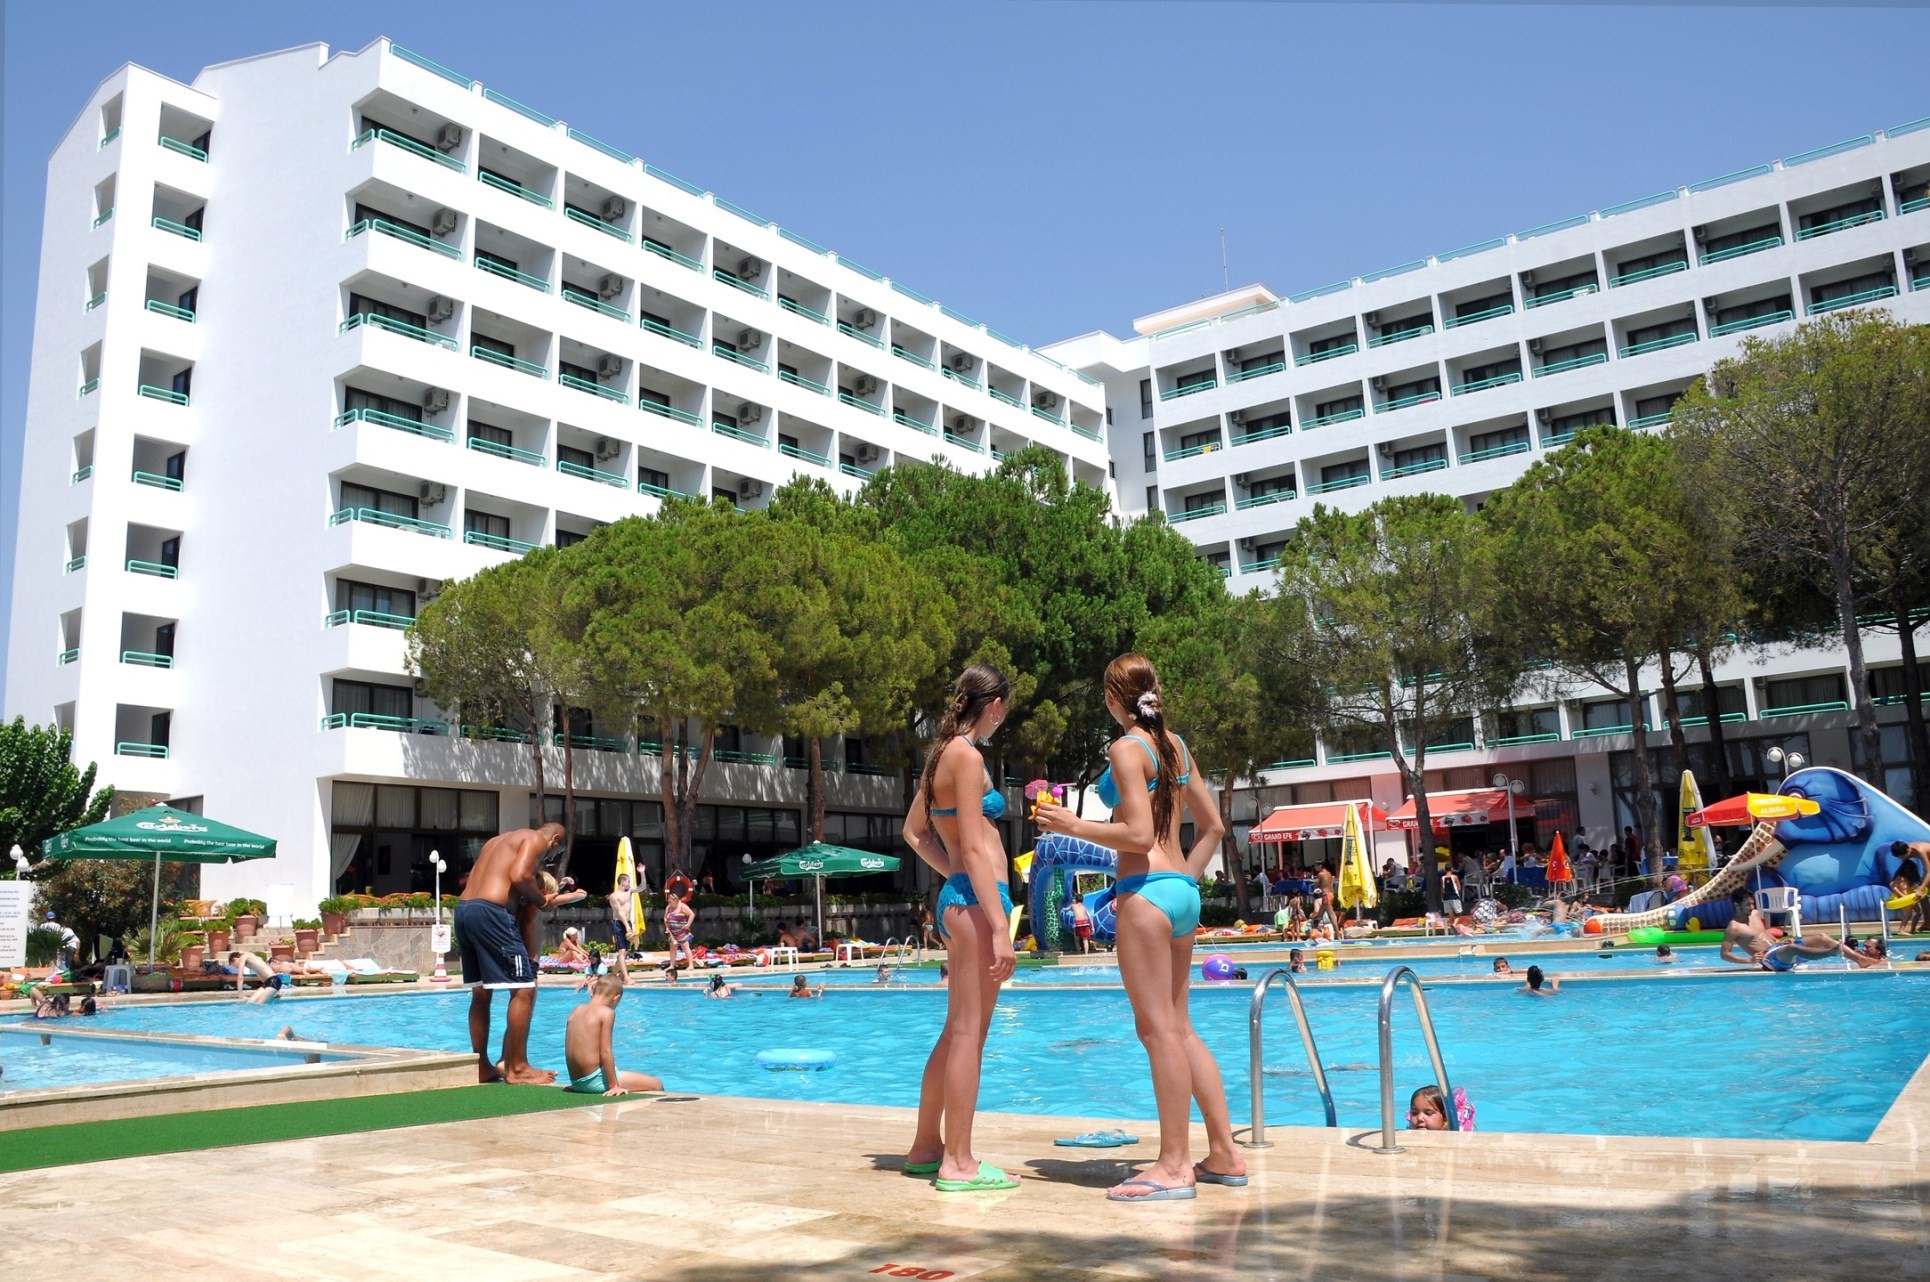 Club Hotel Grand Efe - общ изглед